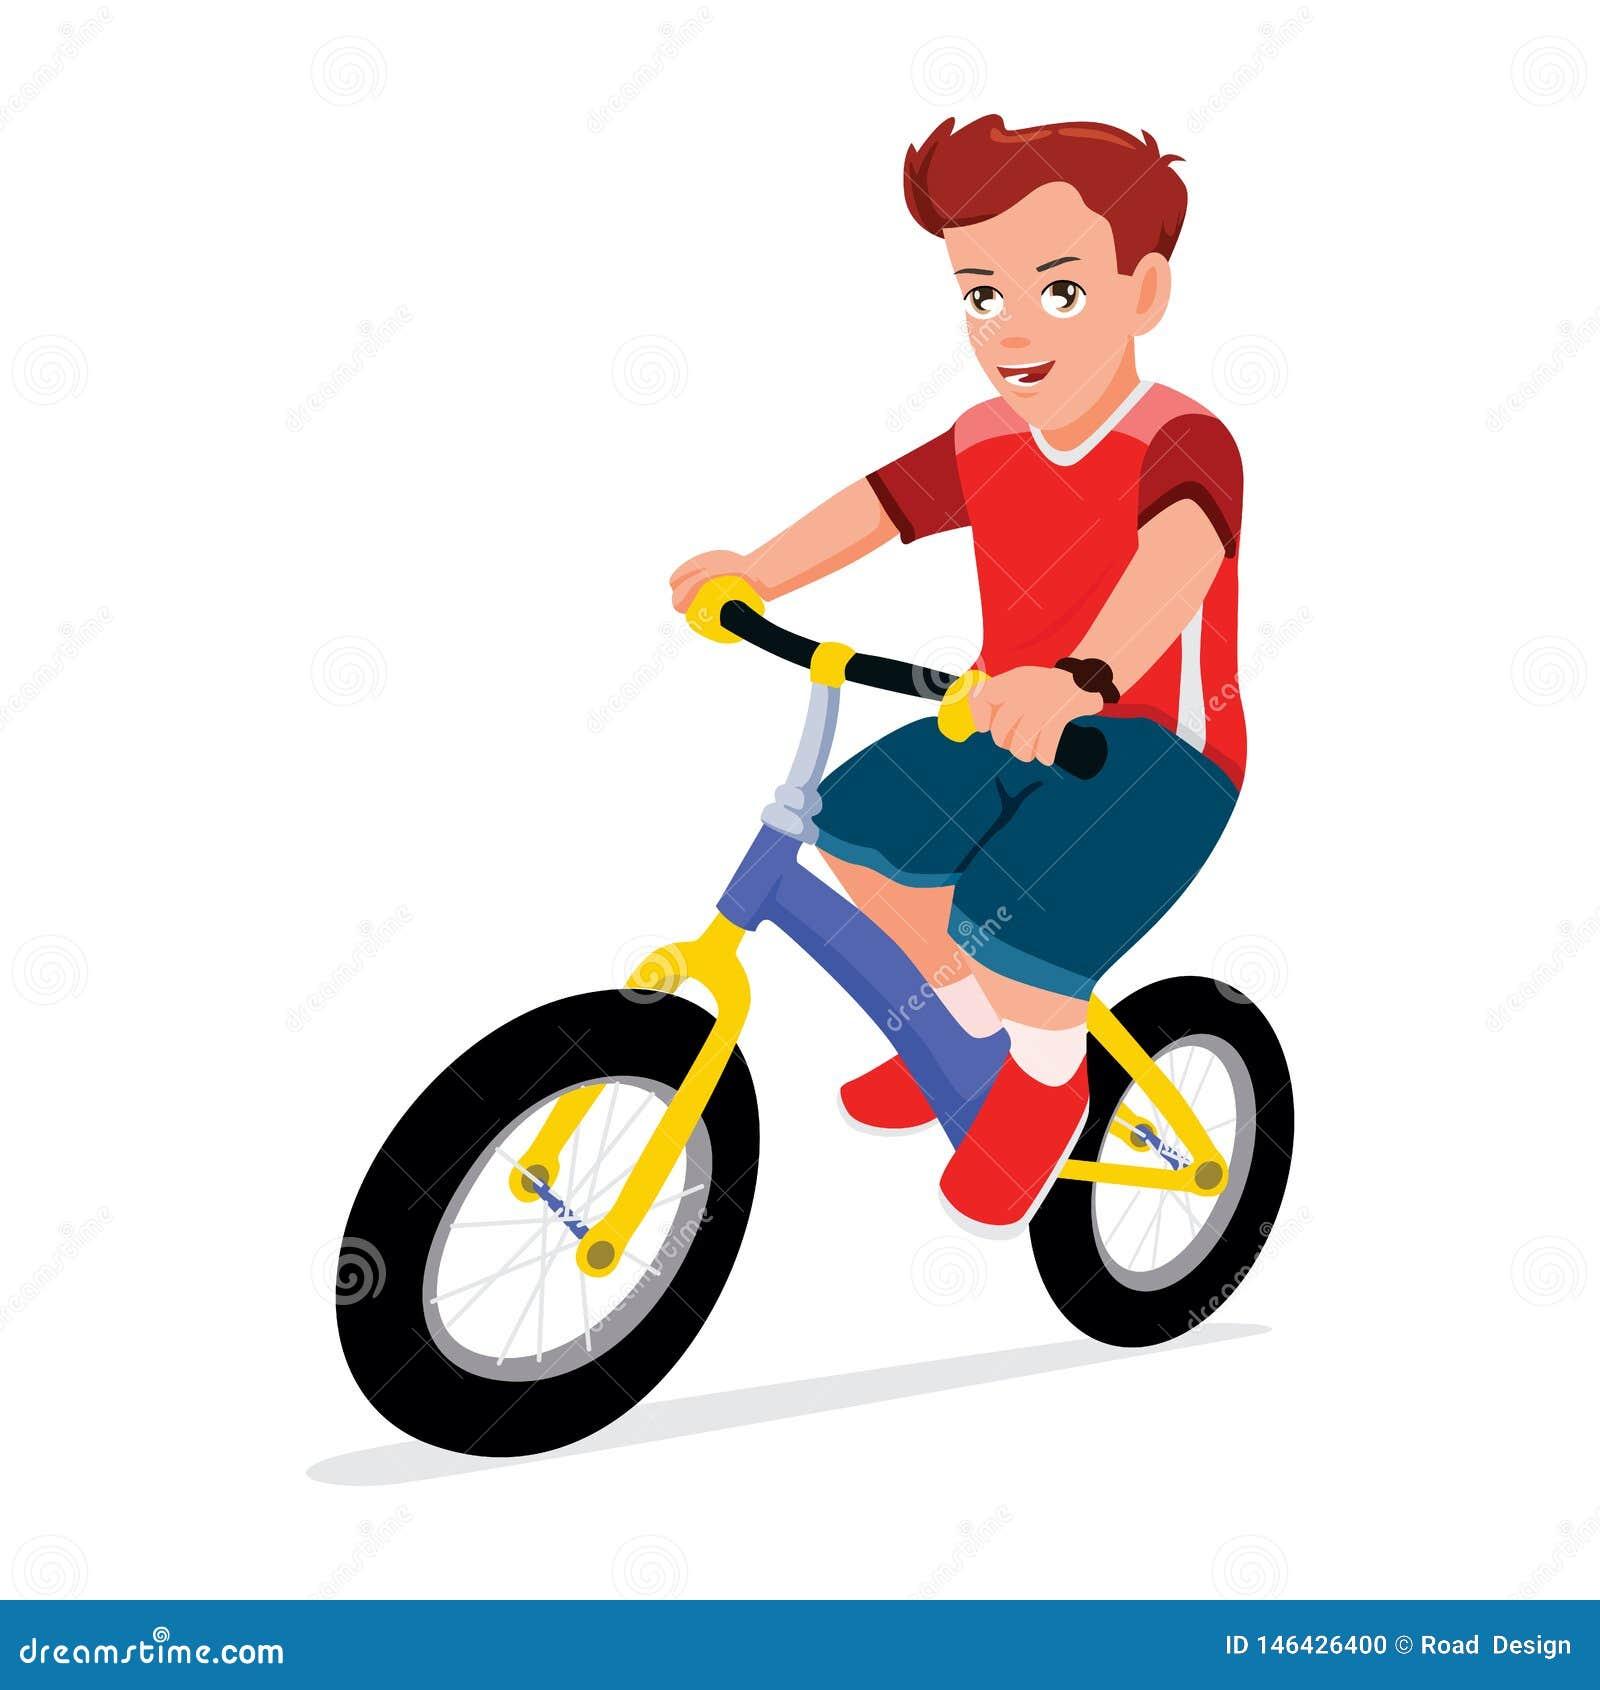 Boy Riding Bike Vector Illustration. Children Playing Bicycle